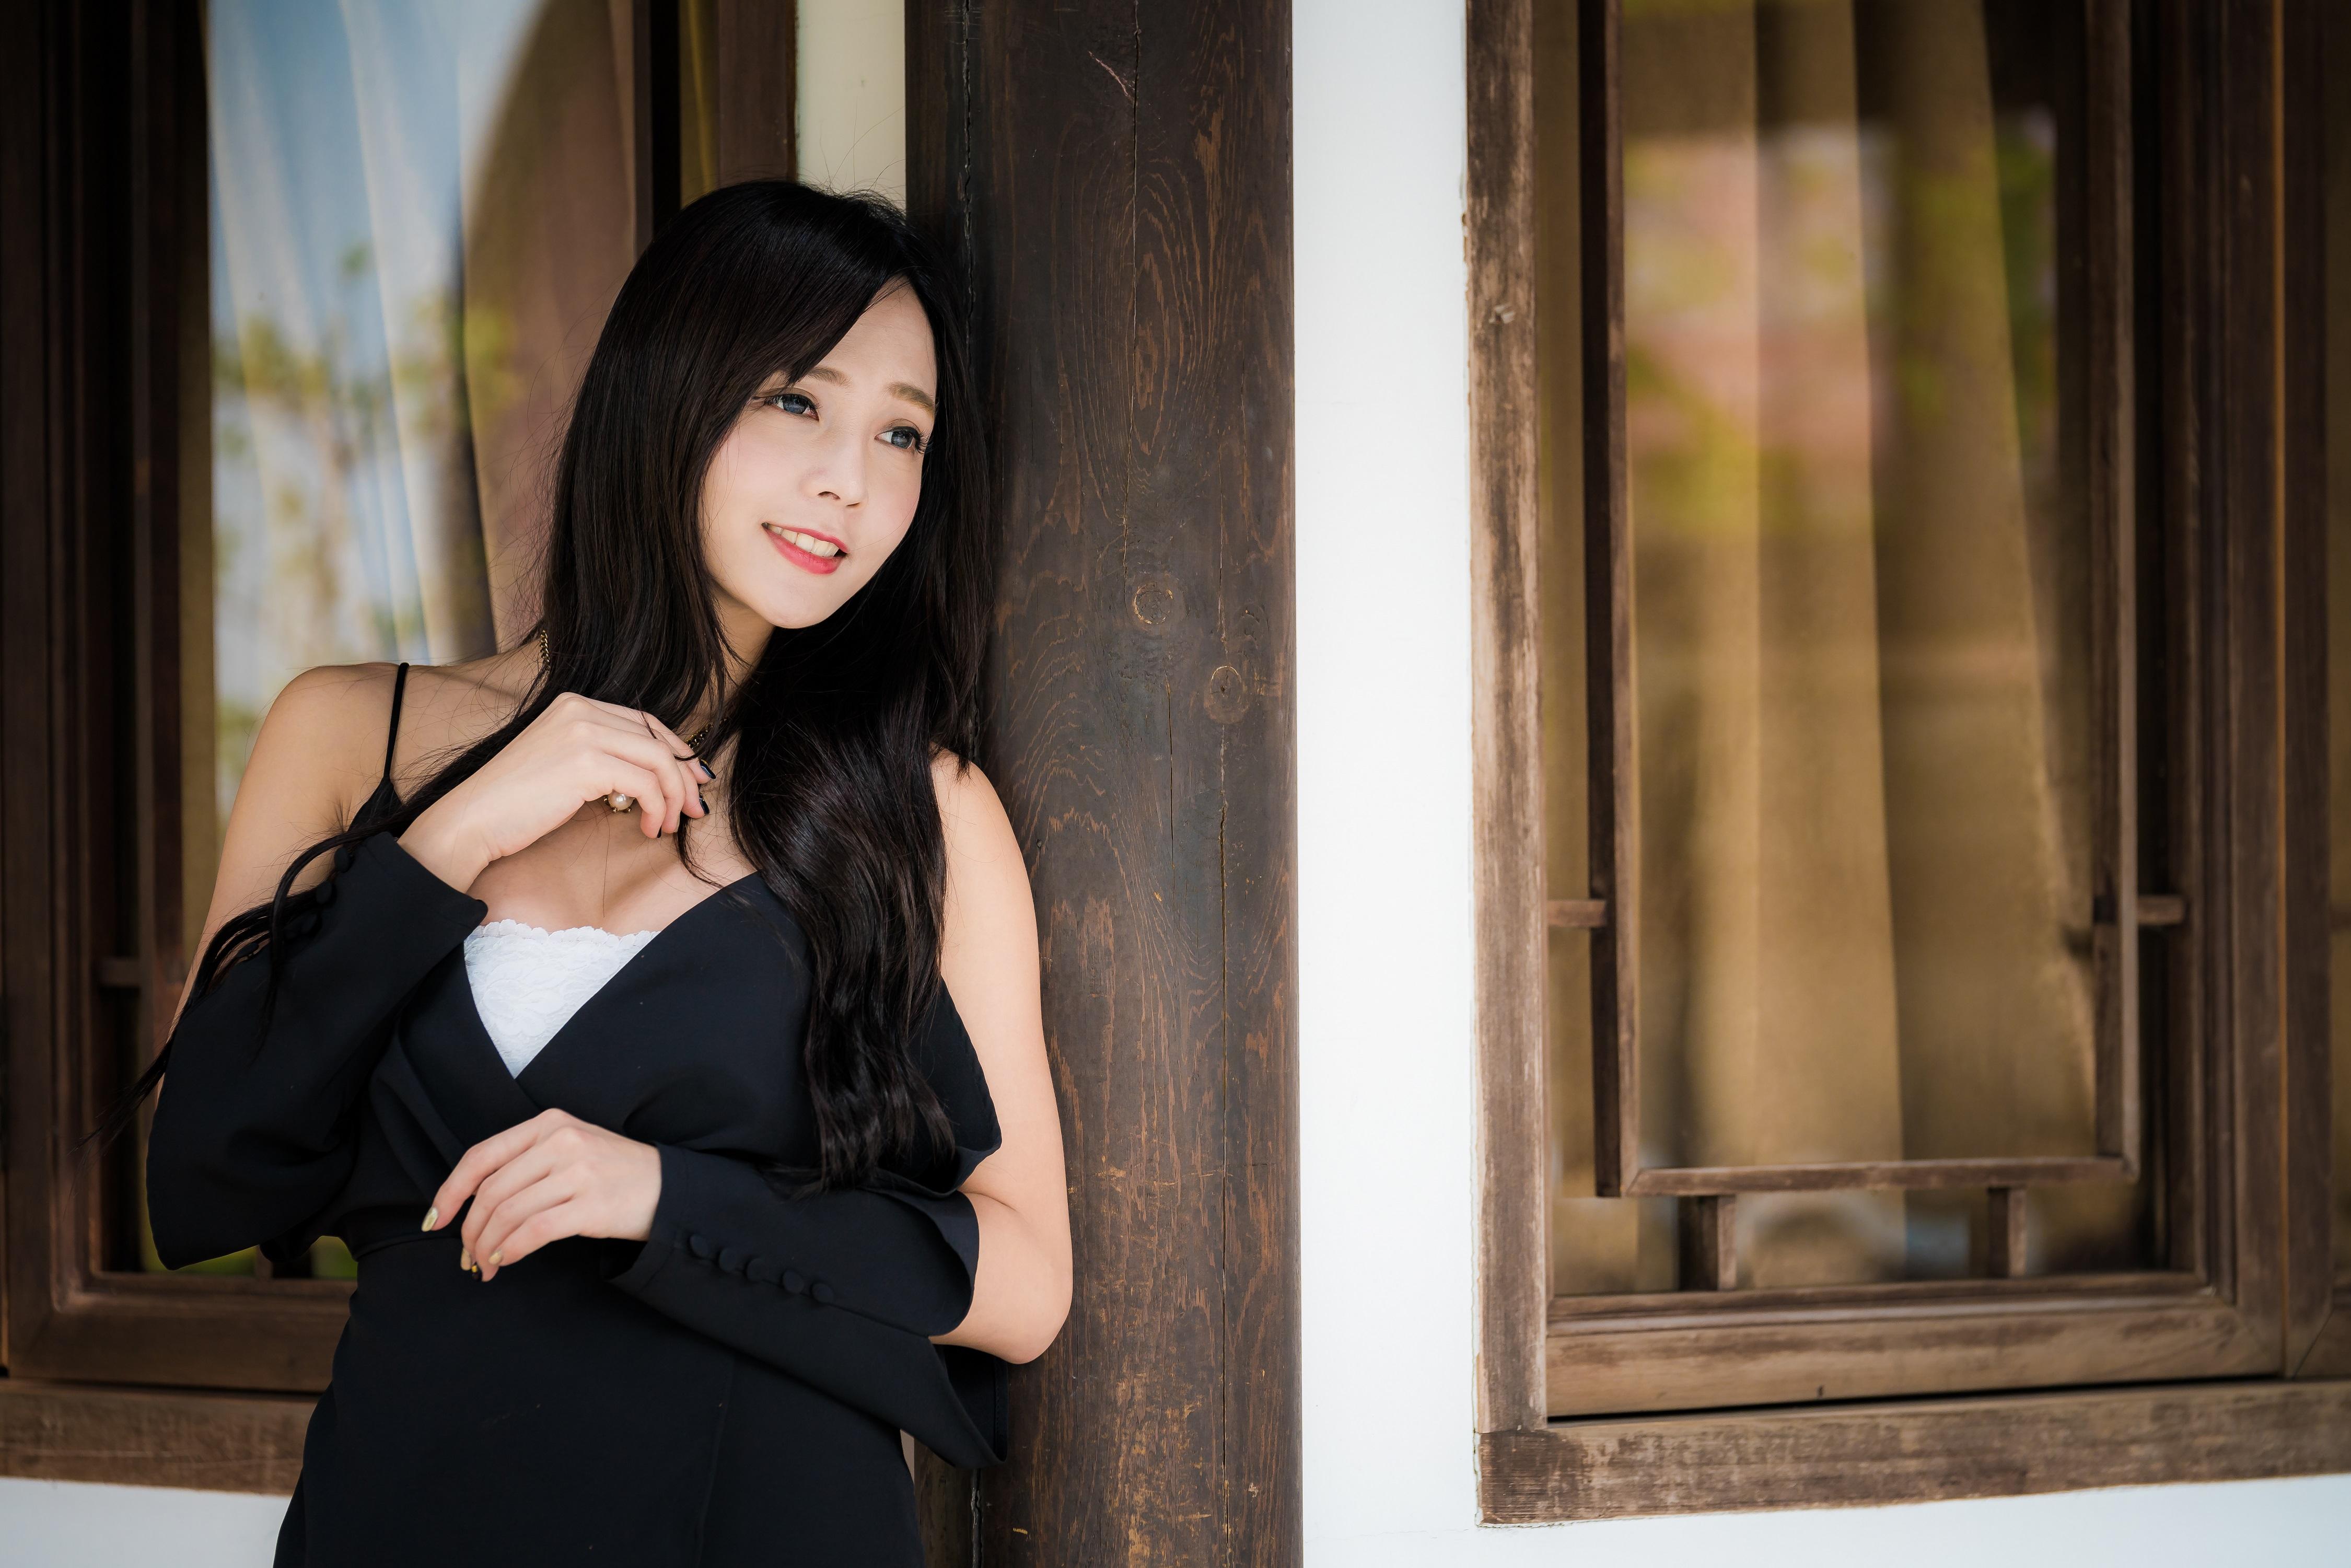 Porn girl asian black internal panty